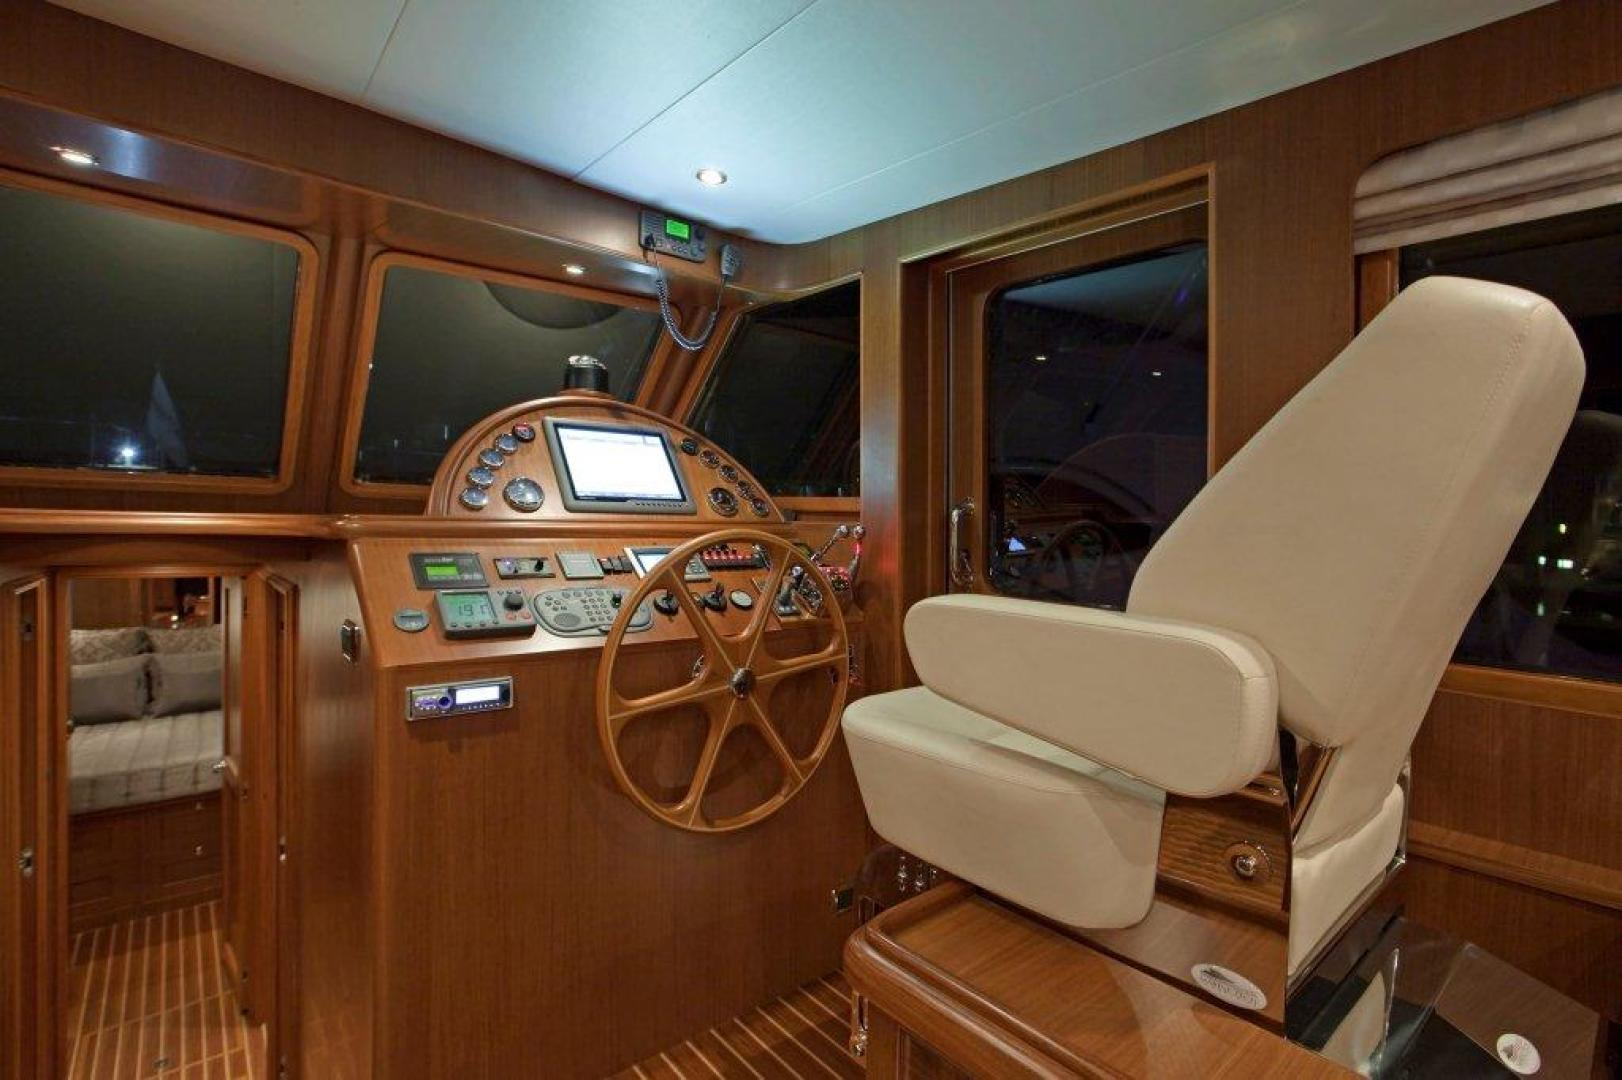 Clipper Motor Yachts-Cordova 52 2011 -Unknown-Singapore-Manufacturer Provided Image: Cordova 52-385781 | Thumbnail